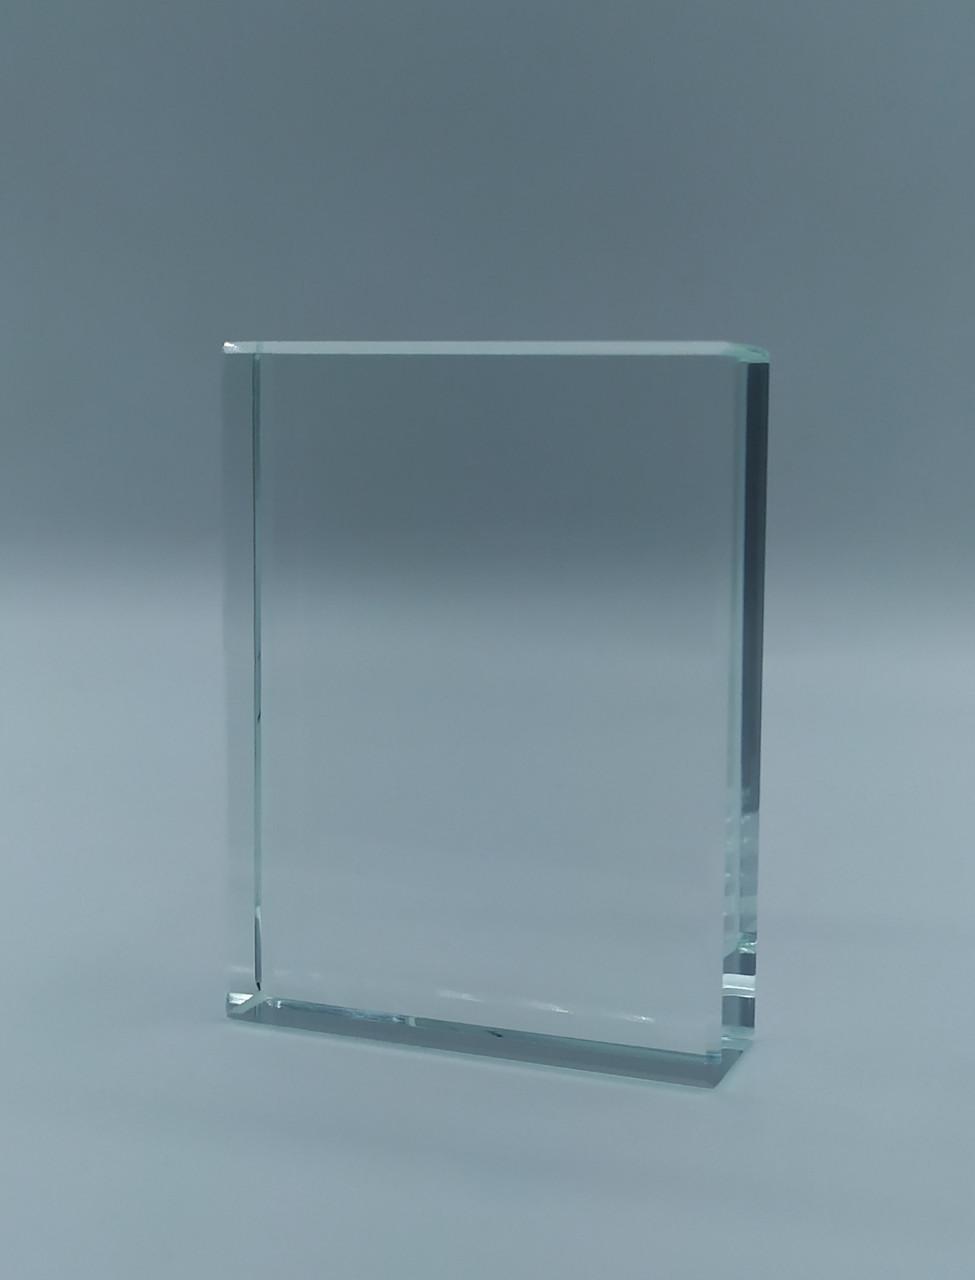 Награда из стекла, размер - 80*60*18 мм